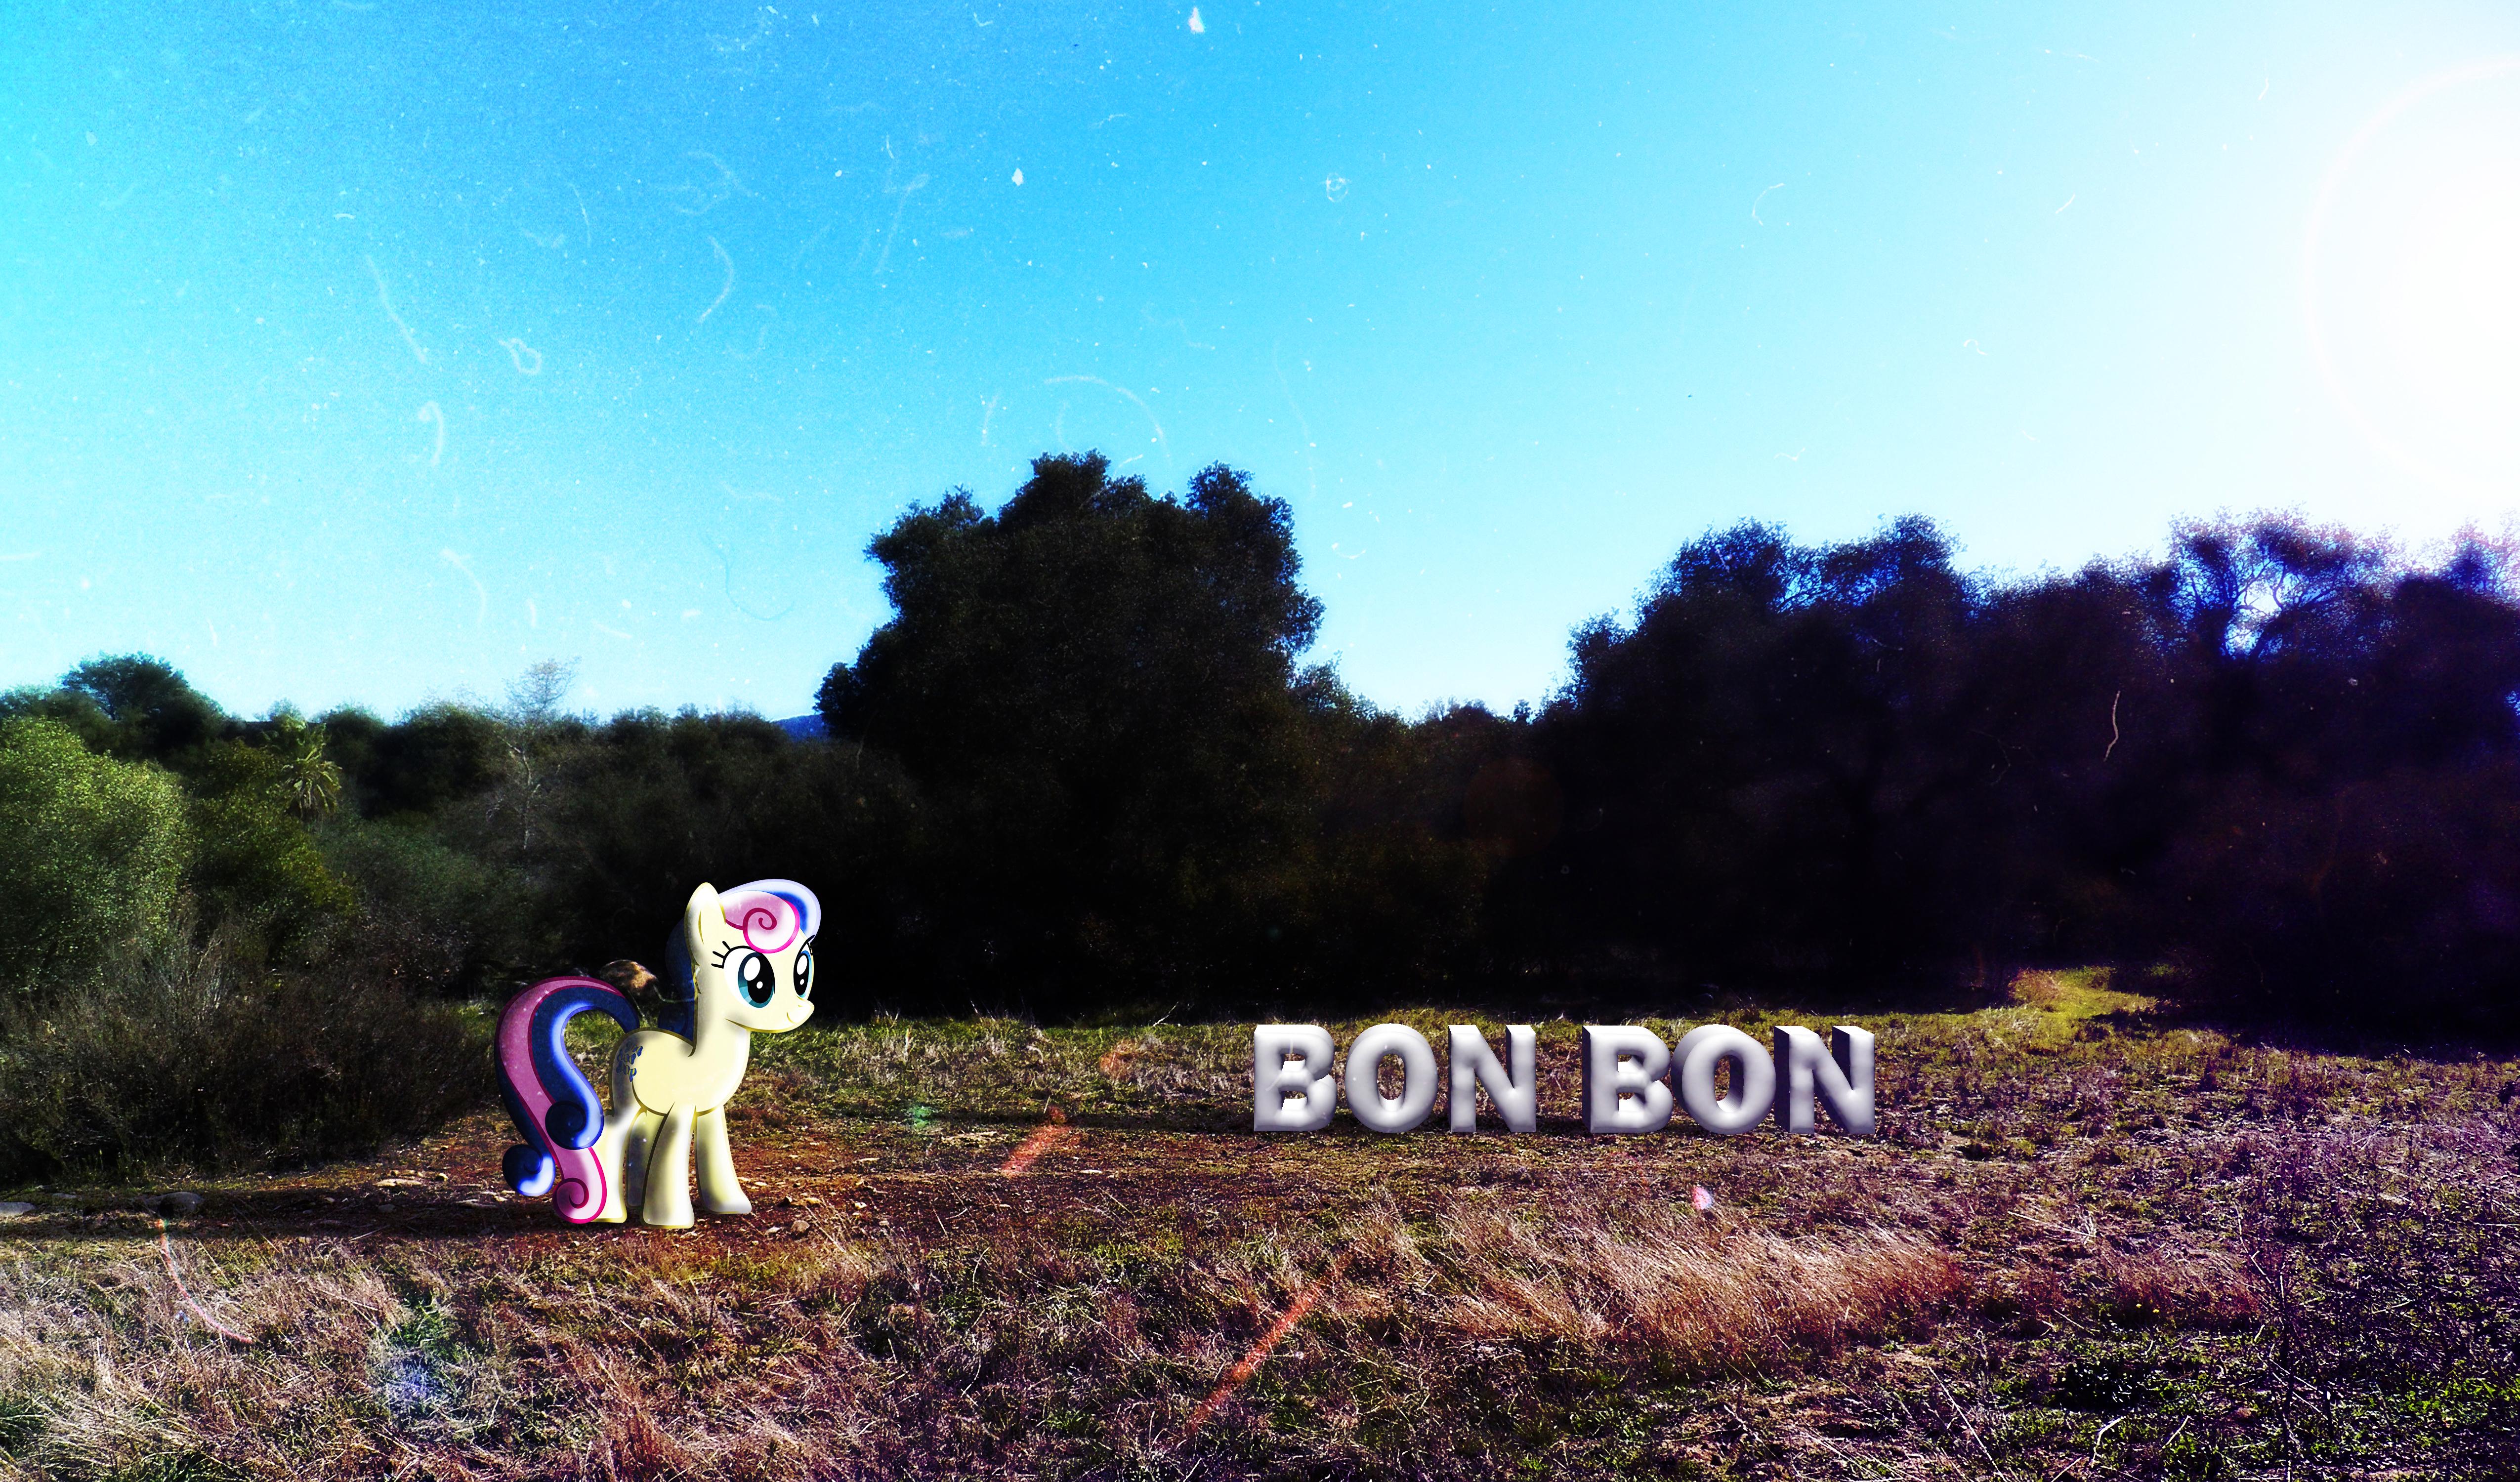 Nature Bon Bon Wallpaper by InternationalTCK and Kna